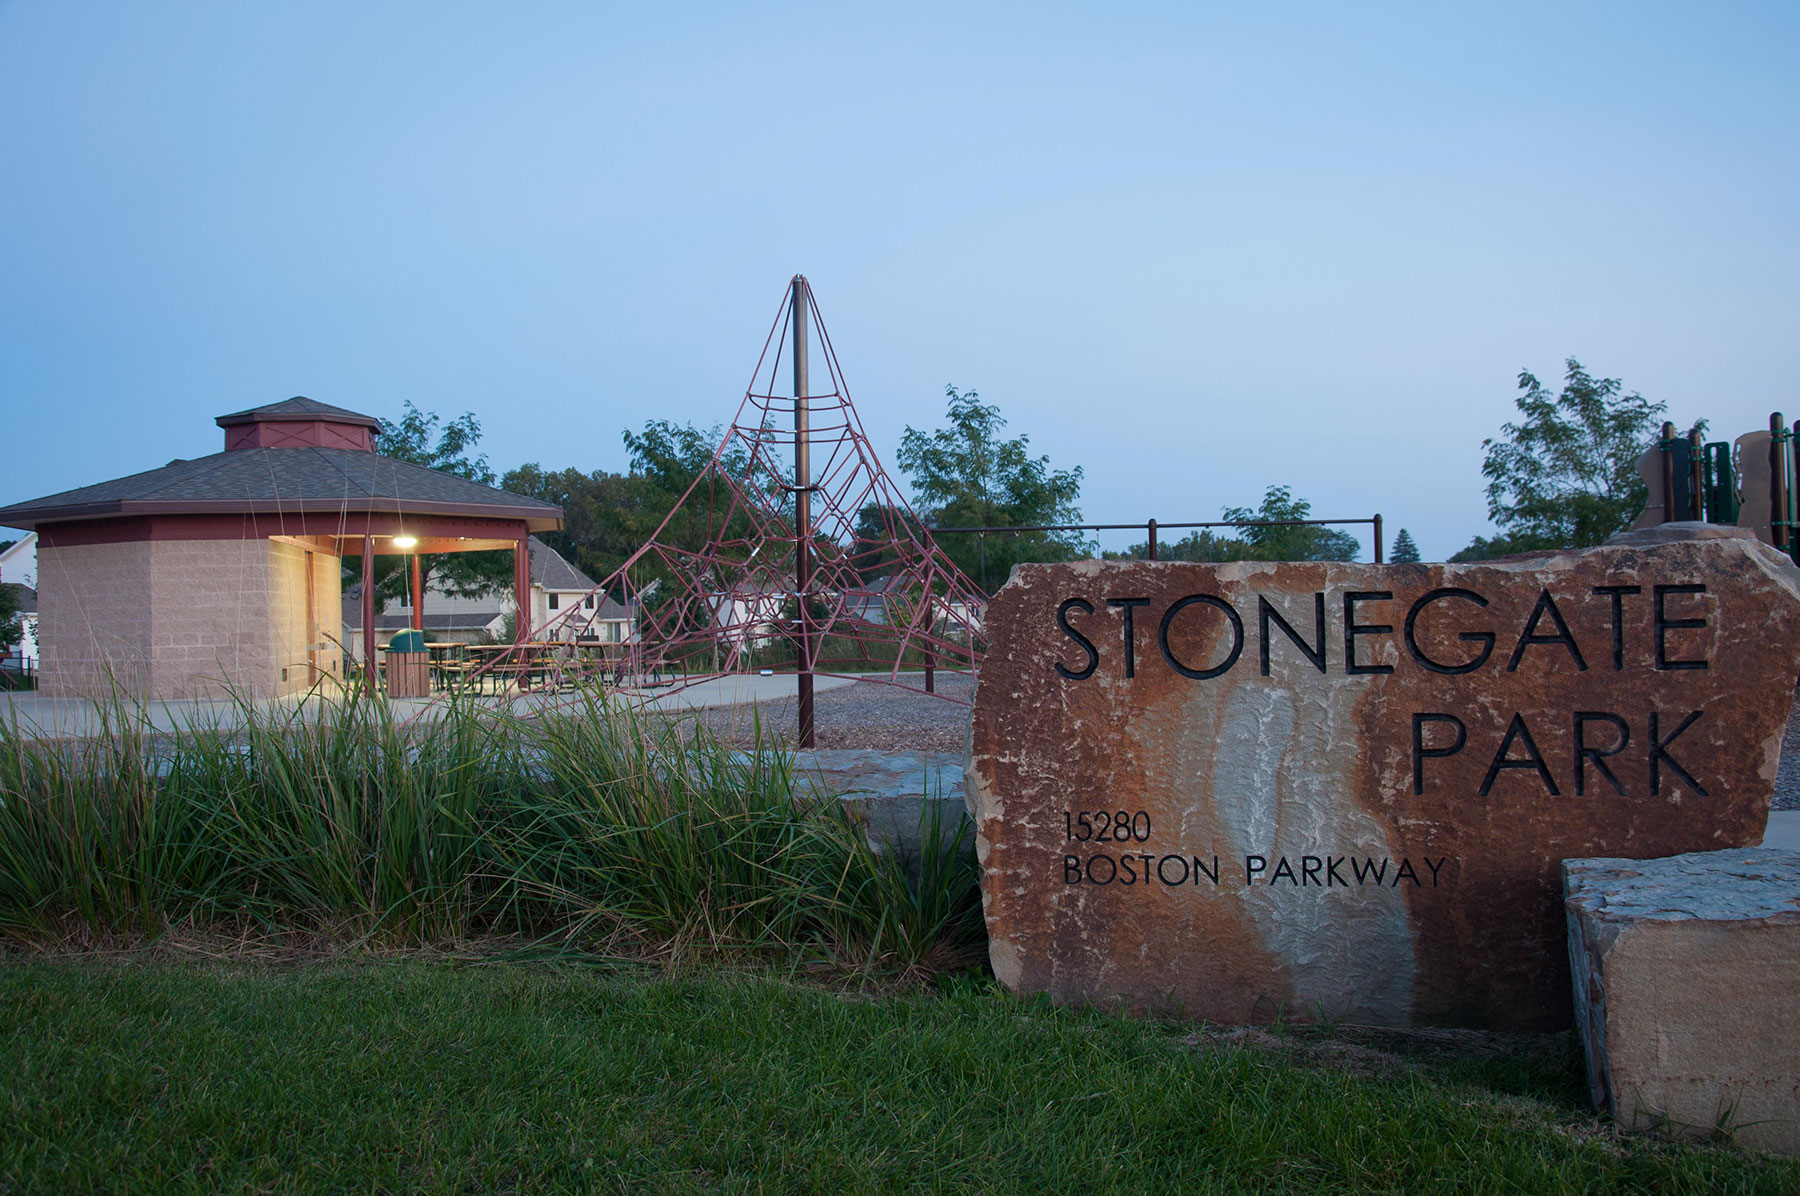 2_stonegate